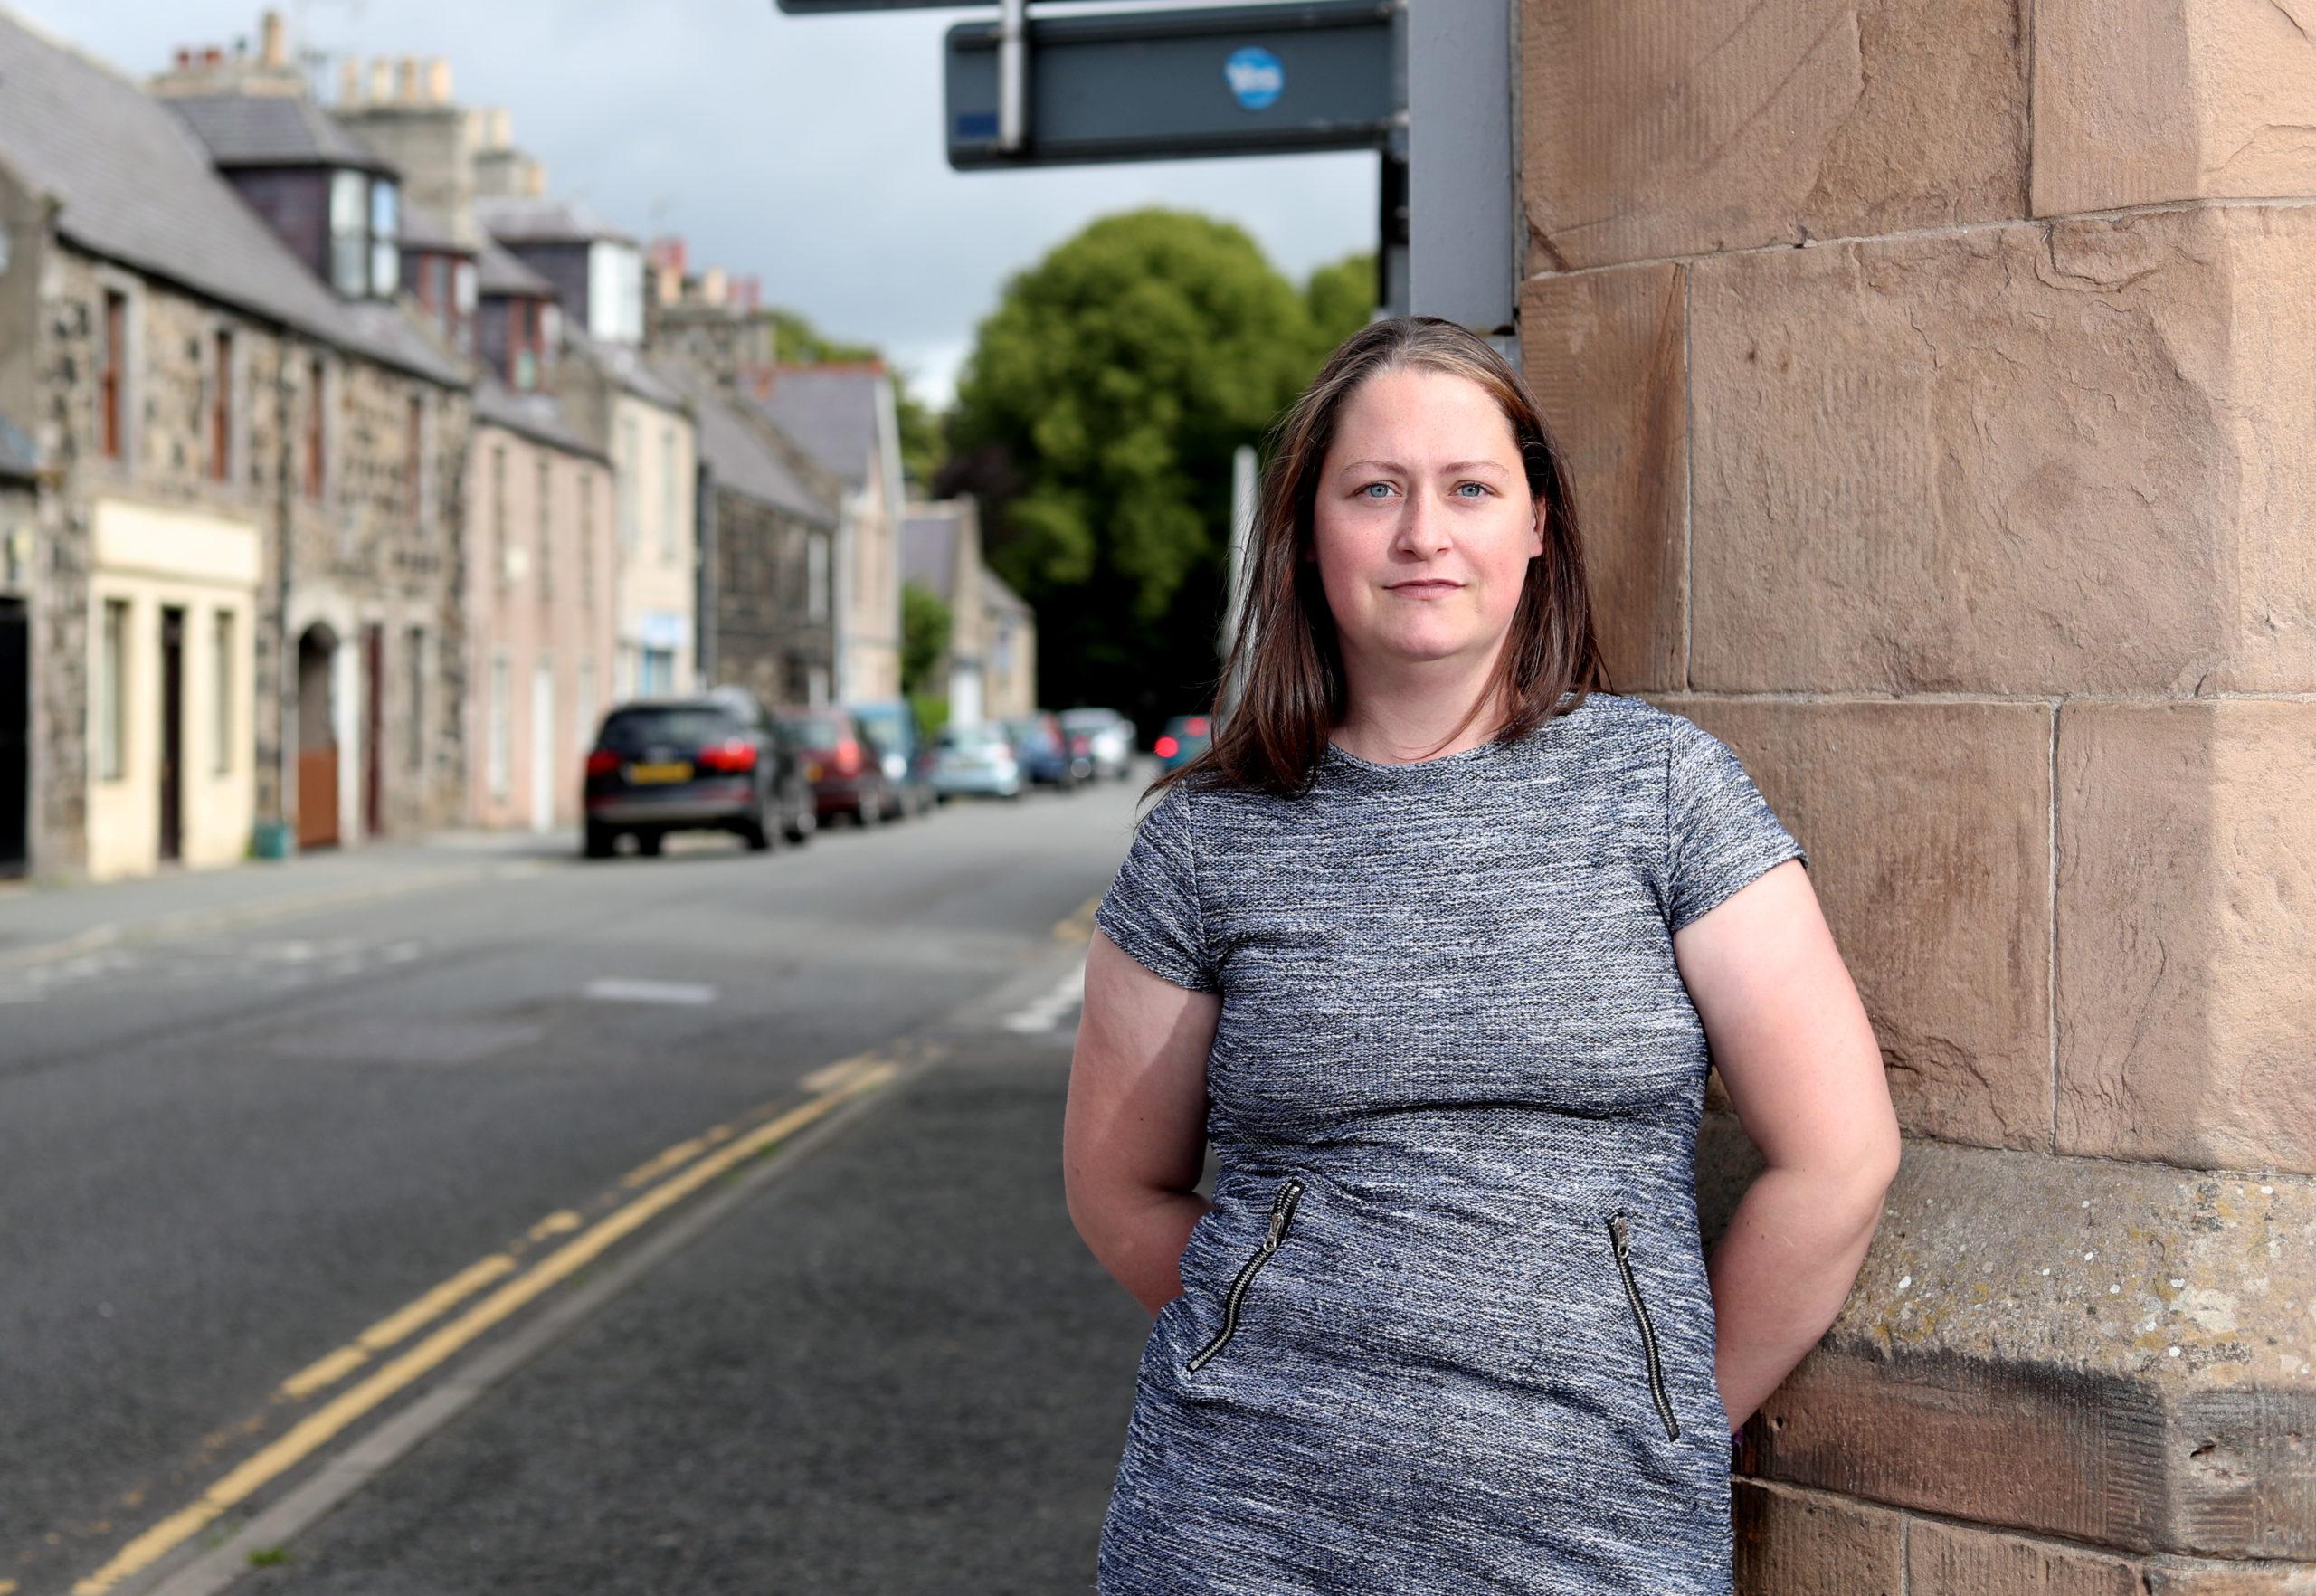 Councillor Gwyneth Petrie